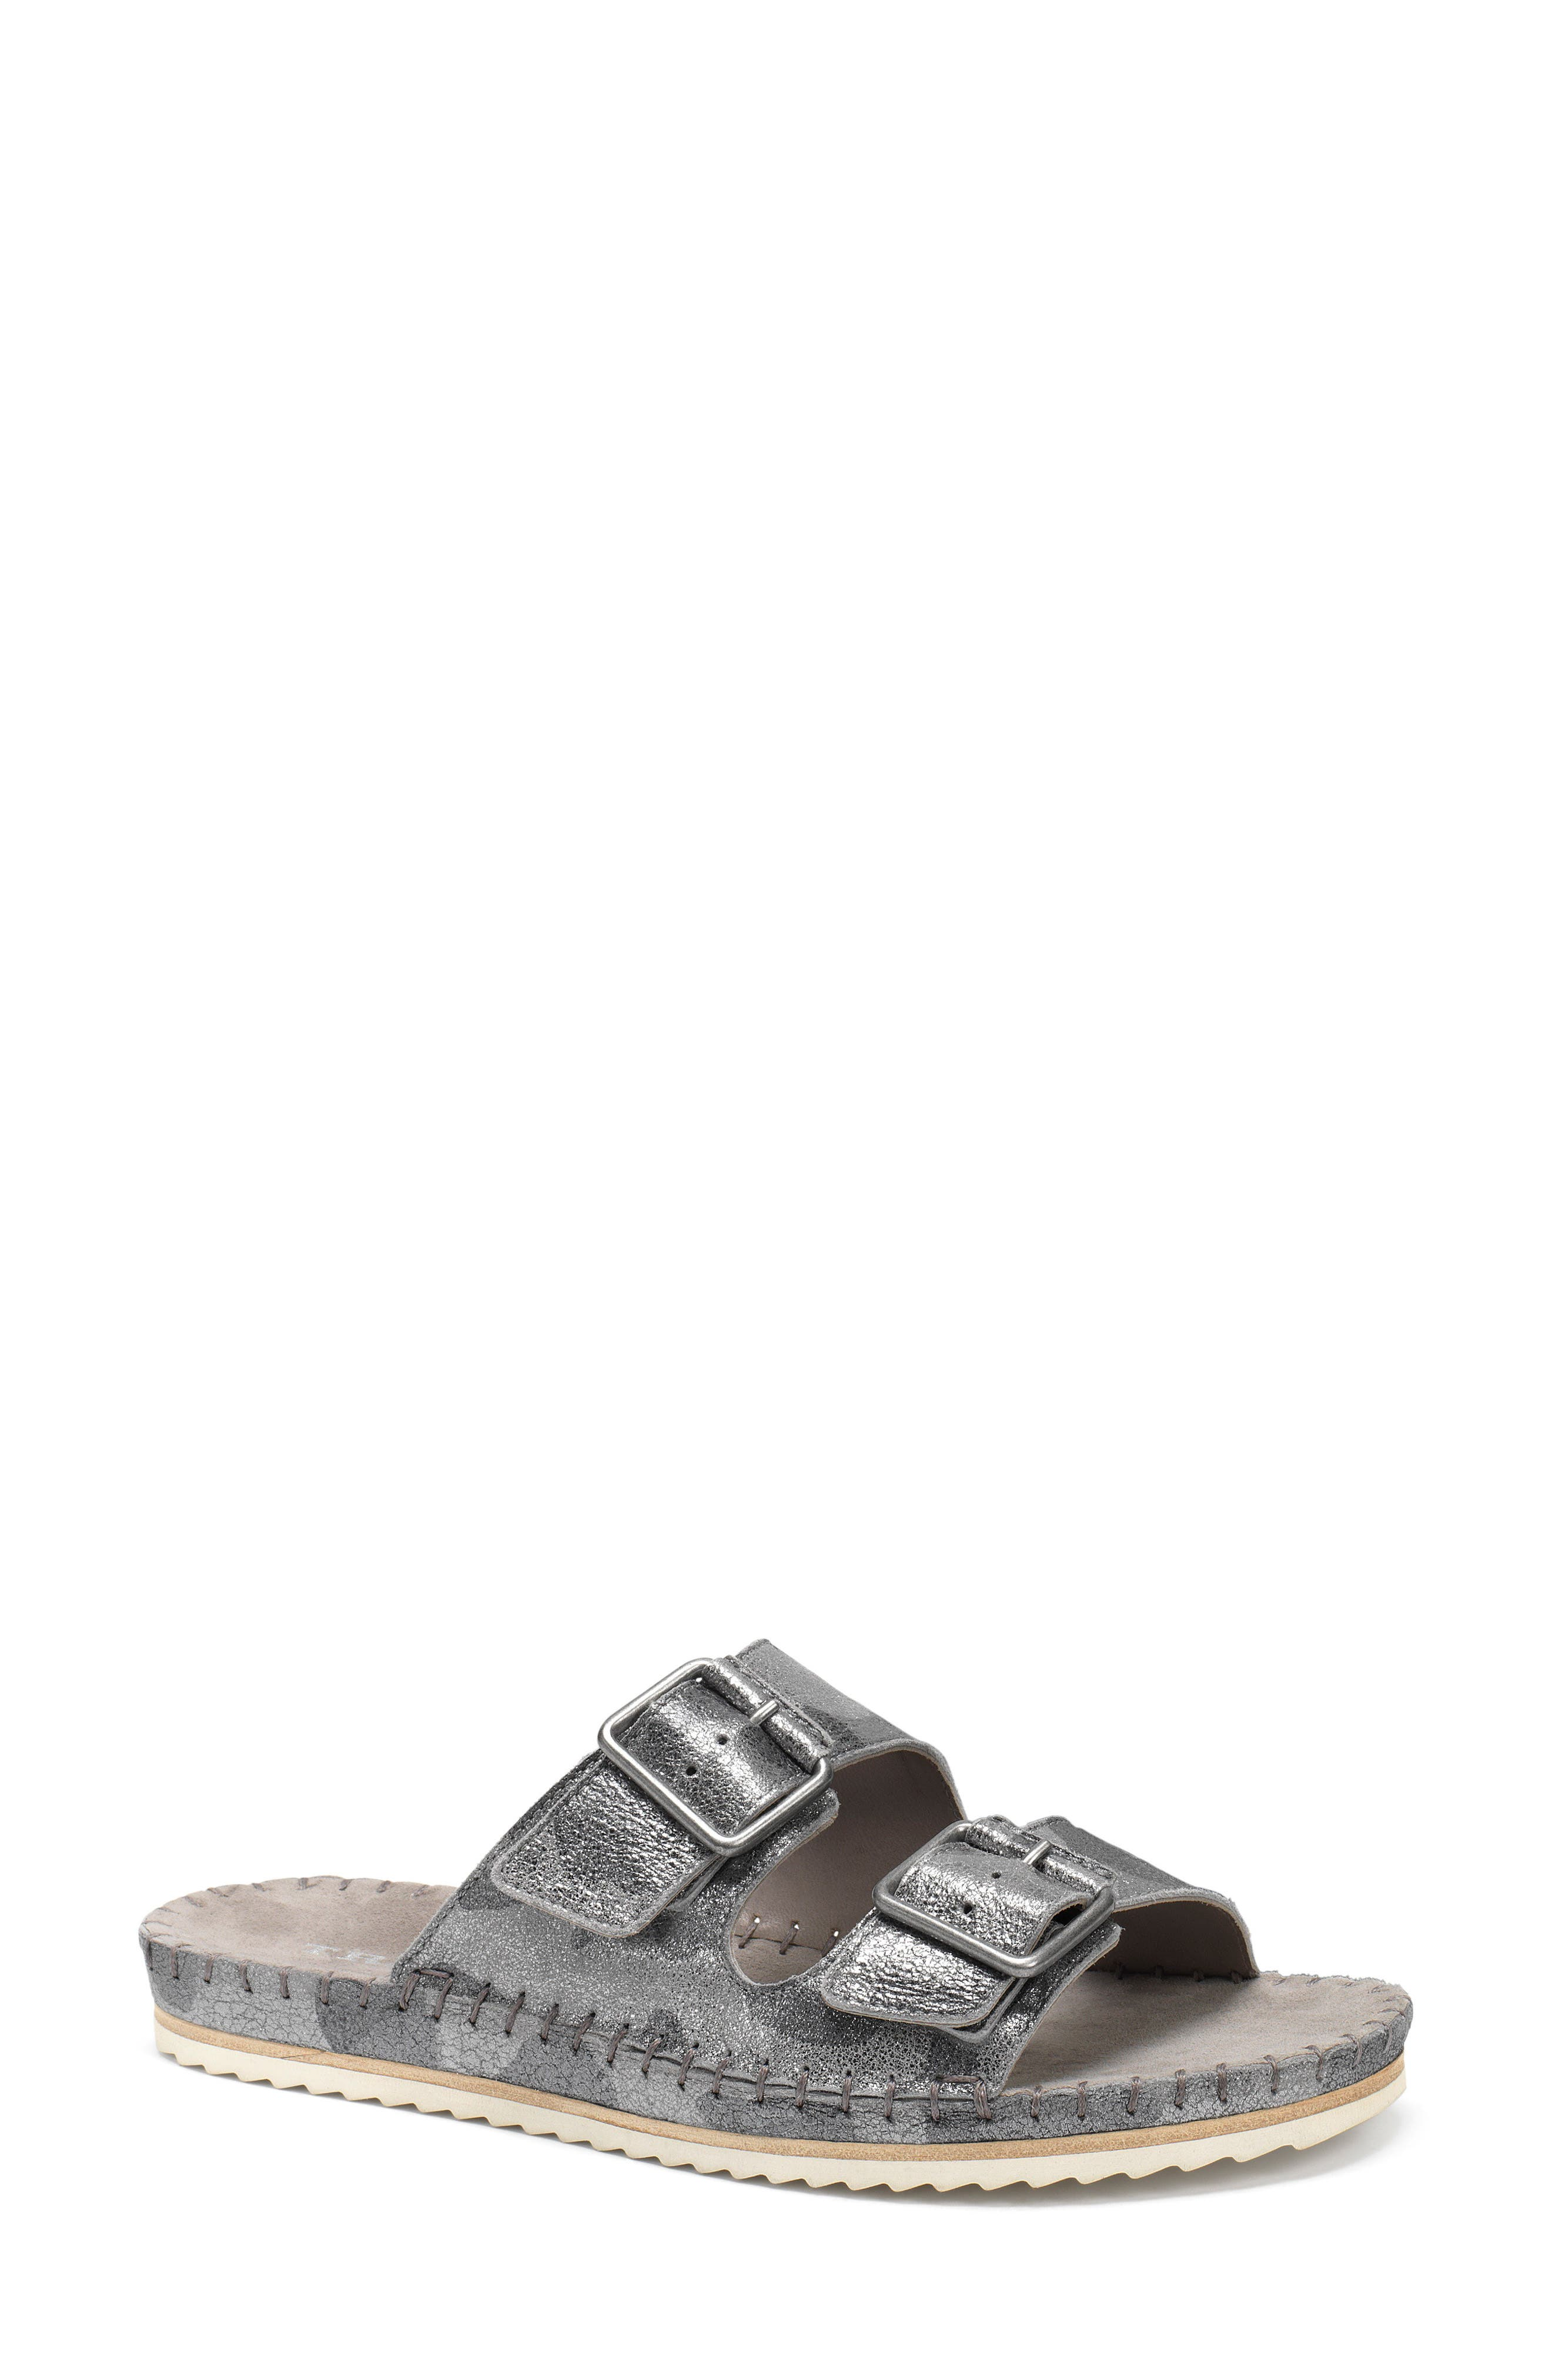 Carli Slide Sandal,                         Main,                         color, Pewter Camo Metallic Suede